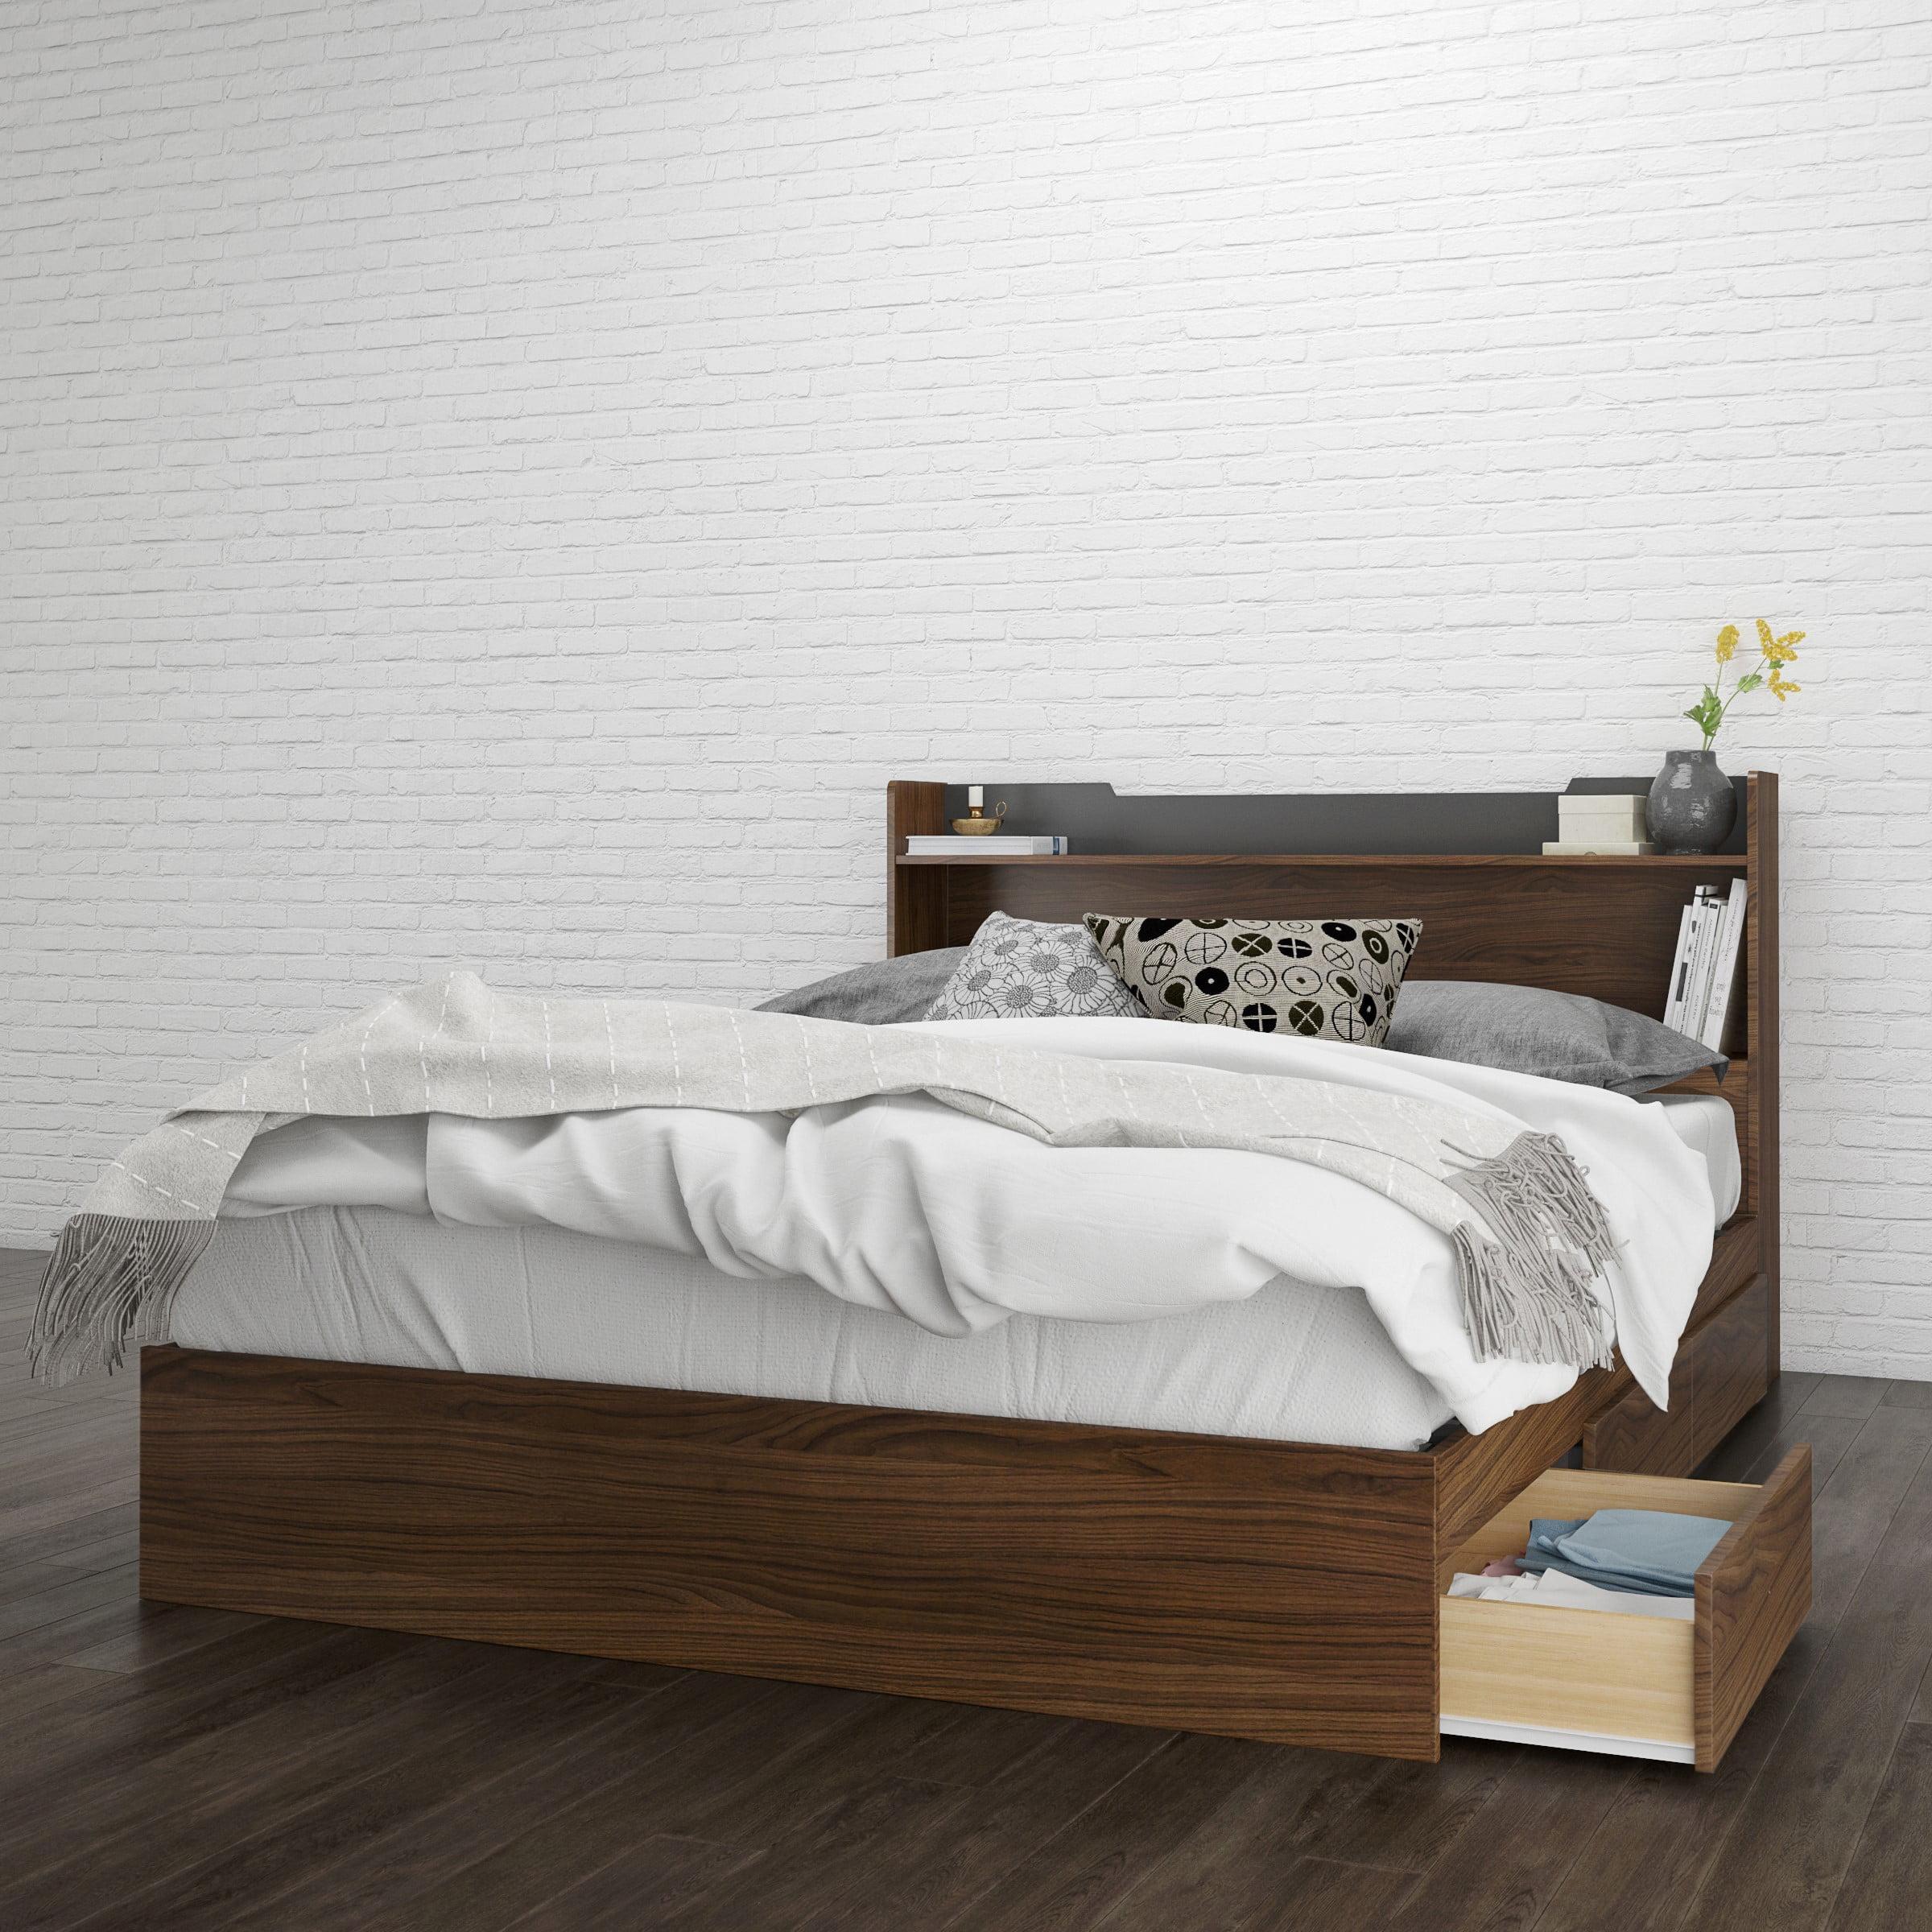 Nexera Cartel Storage Bed and Headboard, Walnut & Charcoal